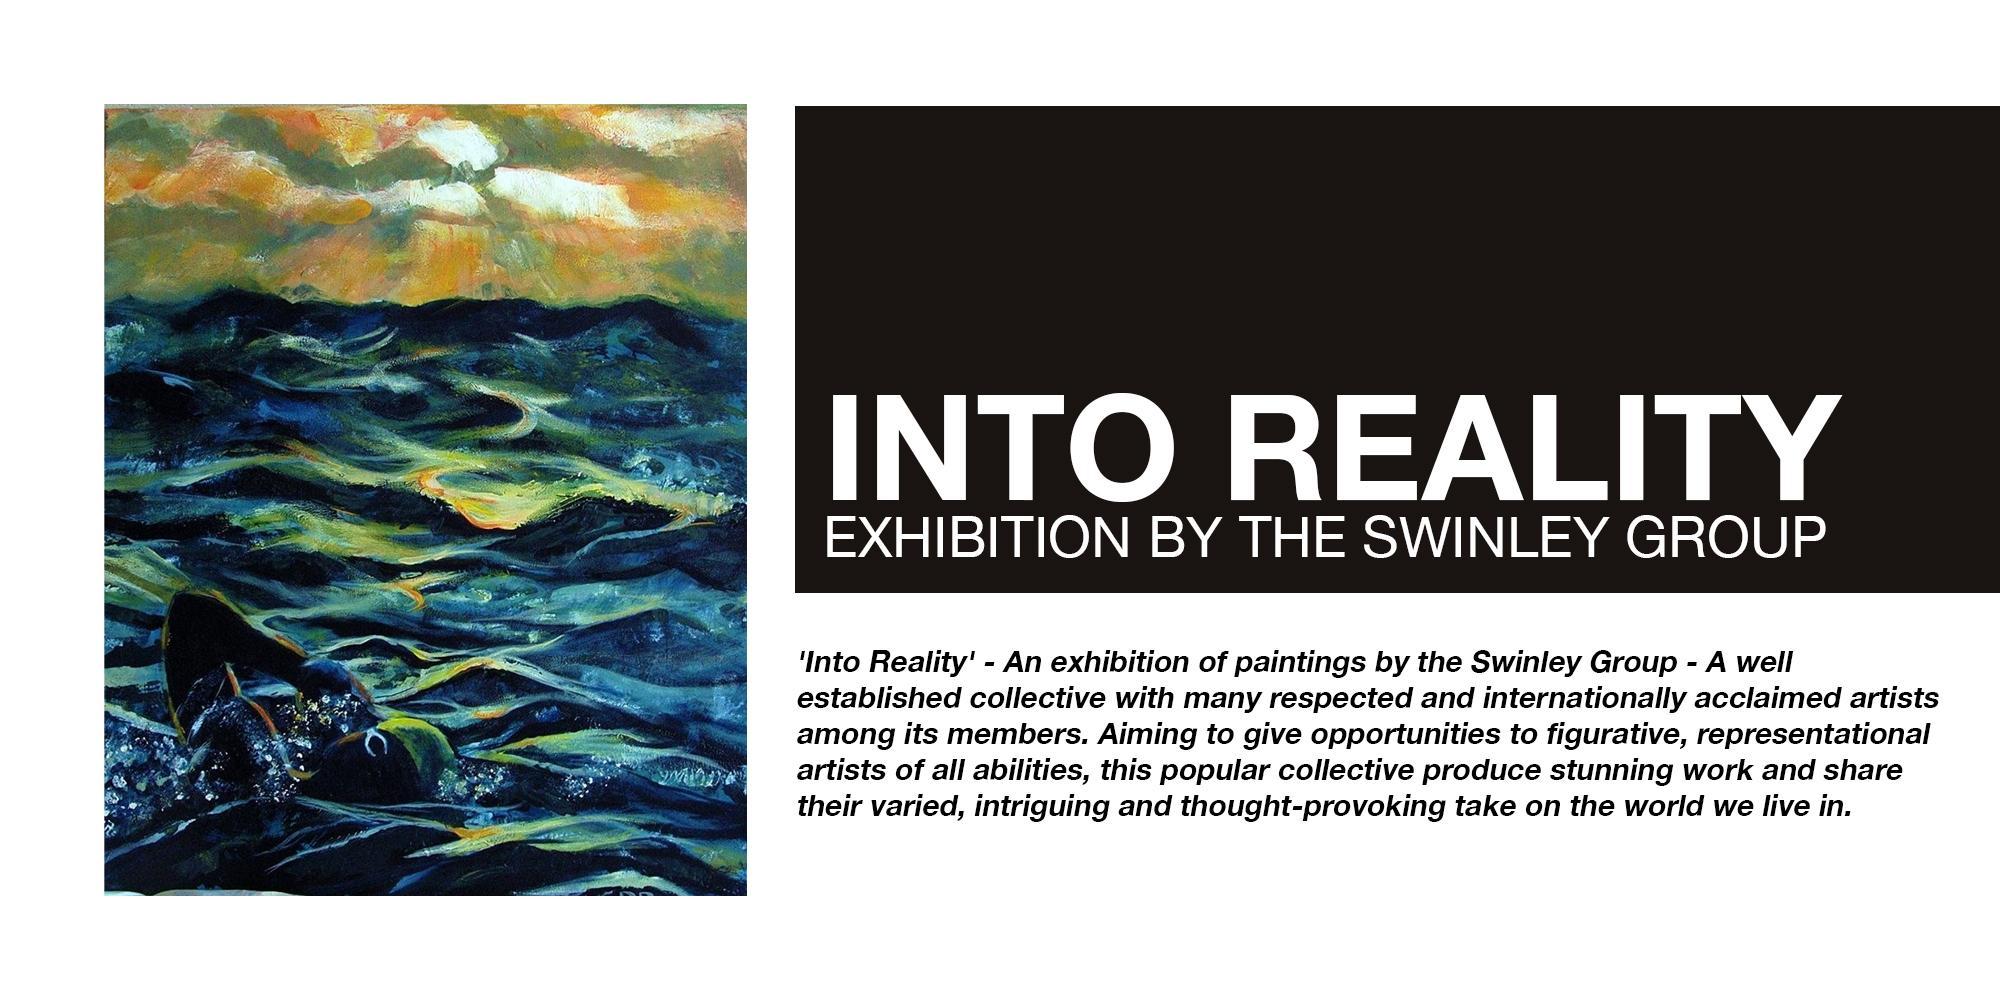 ART EXHIBITION : INTO REALITY